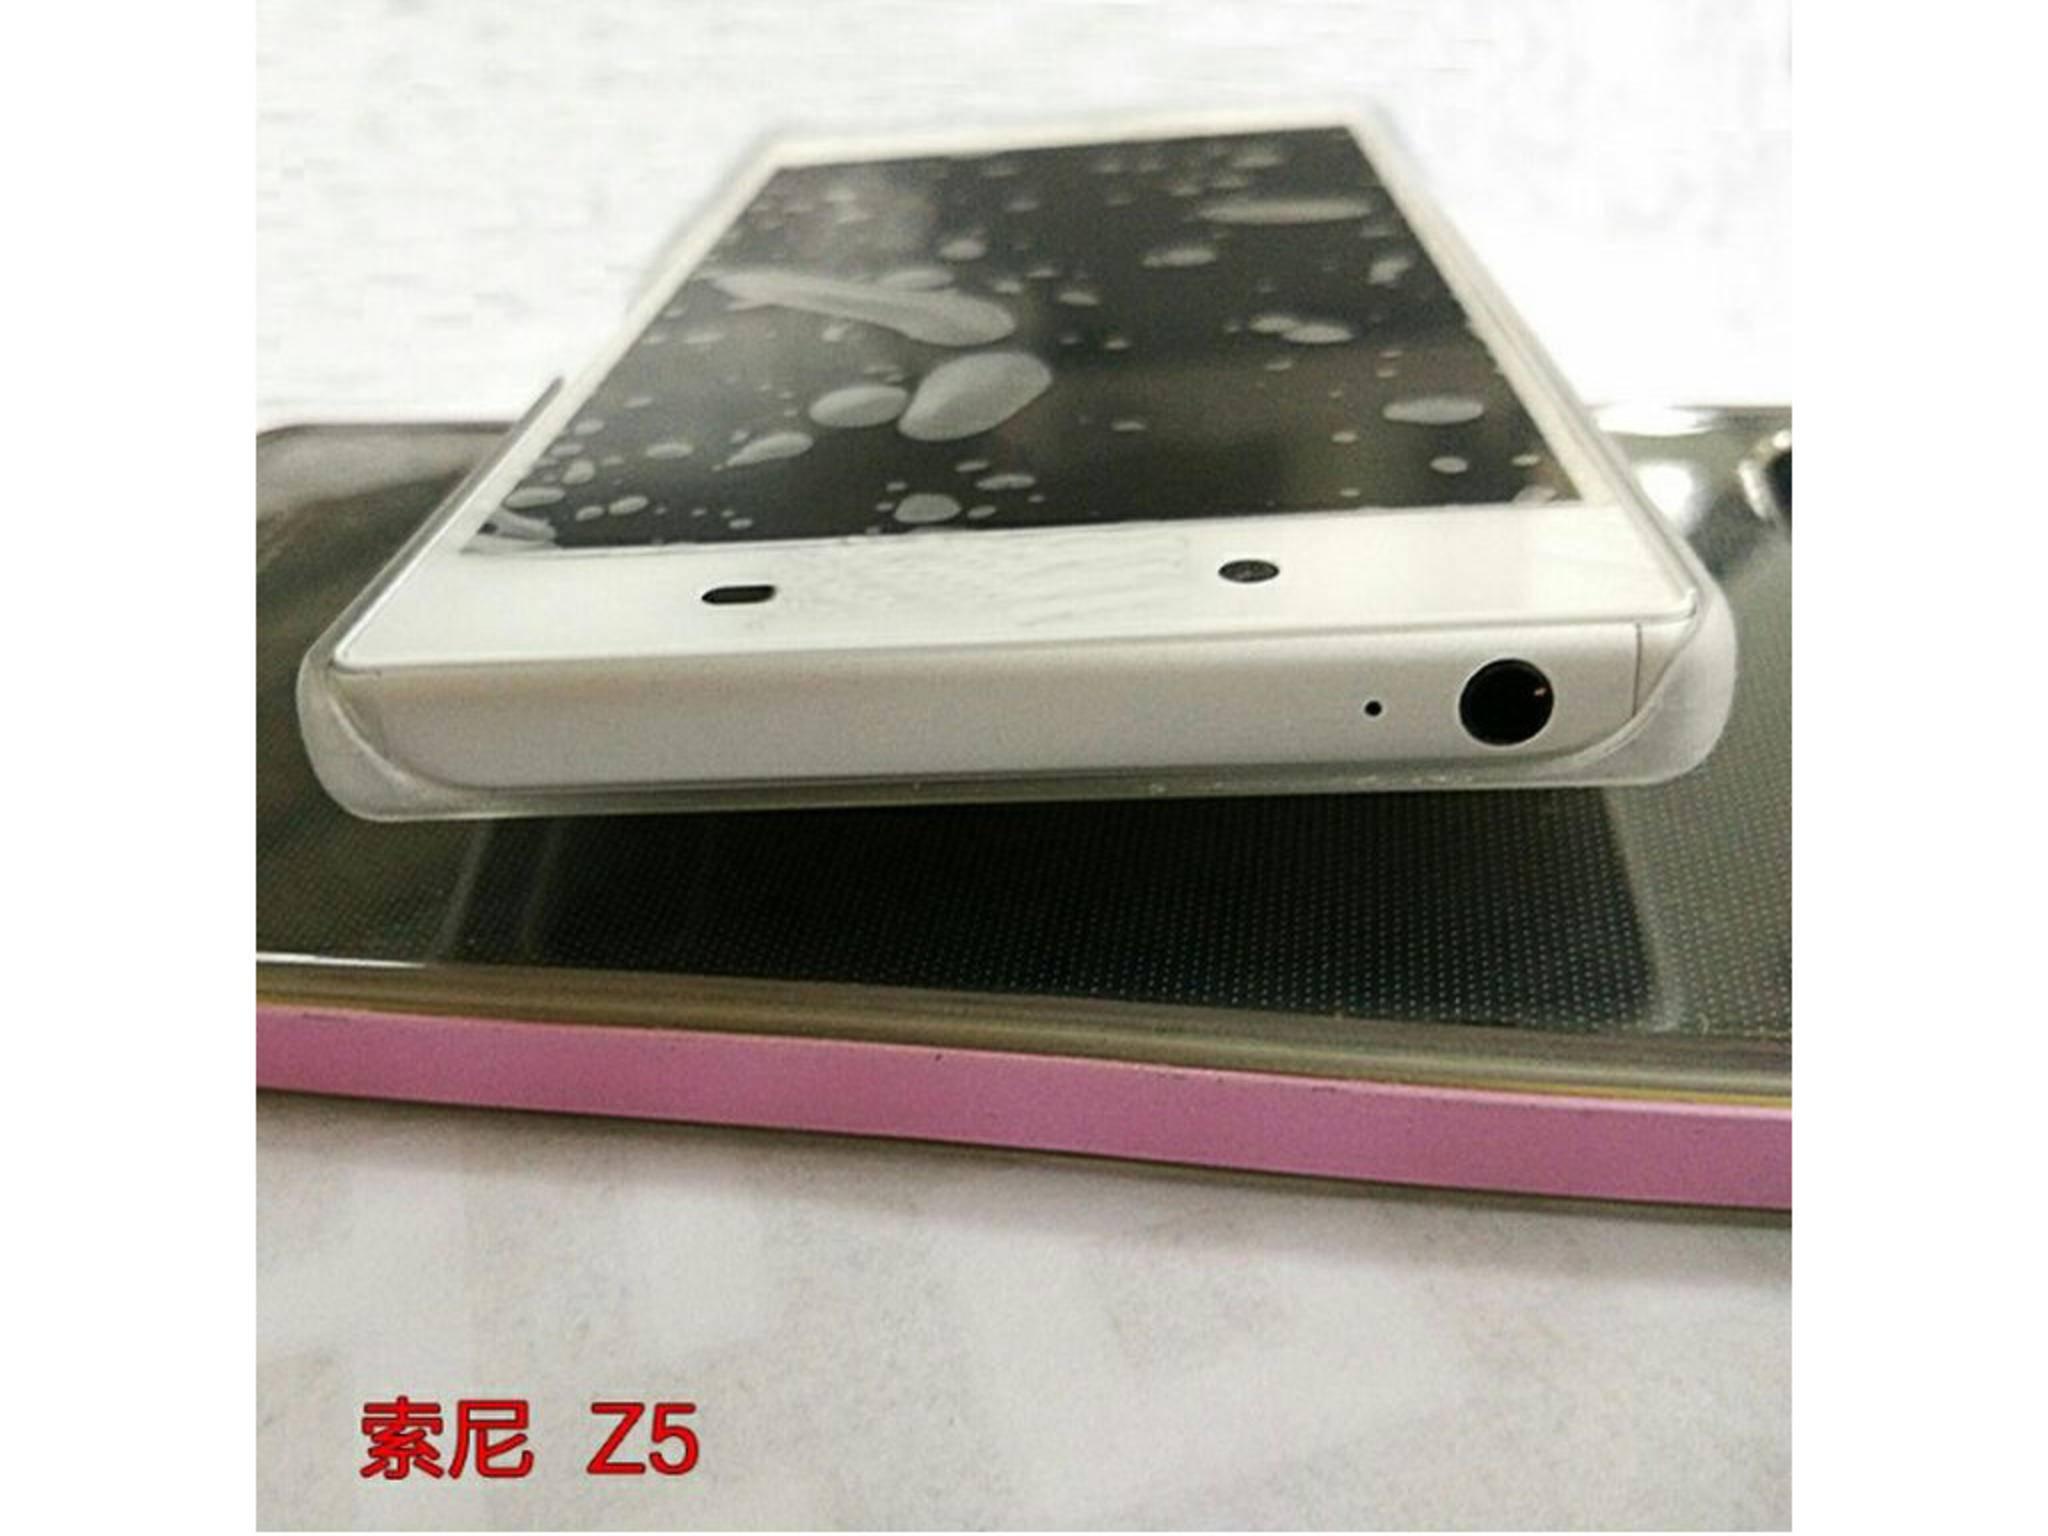 Leak-Bilder des Sony Xperia Z5.